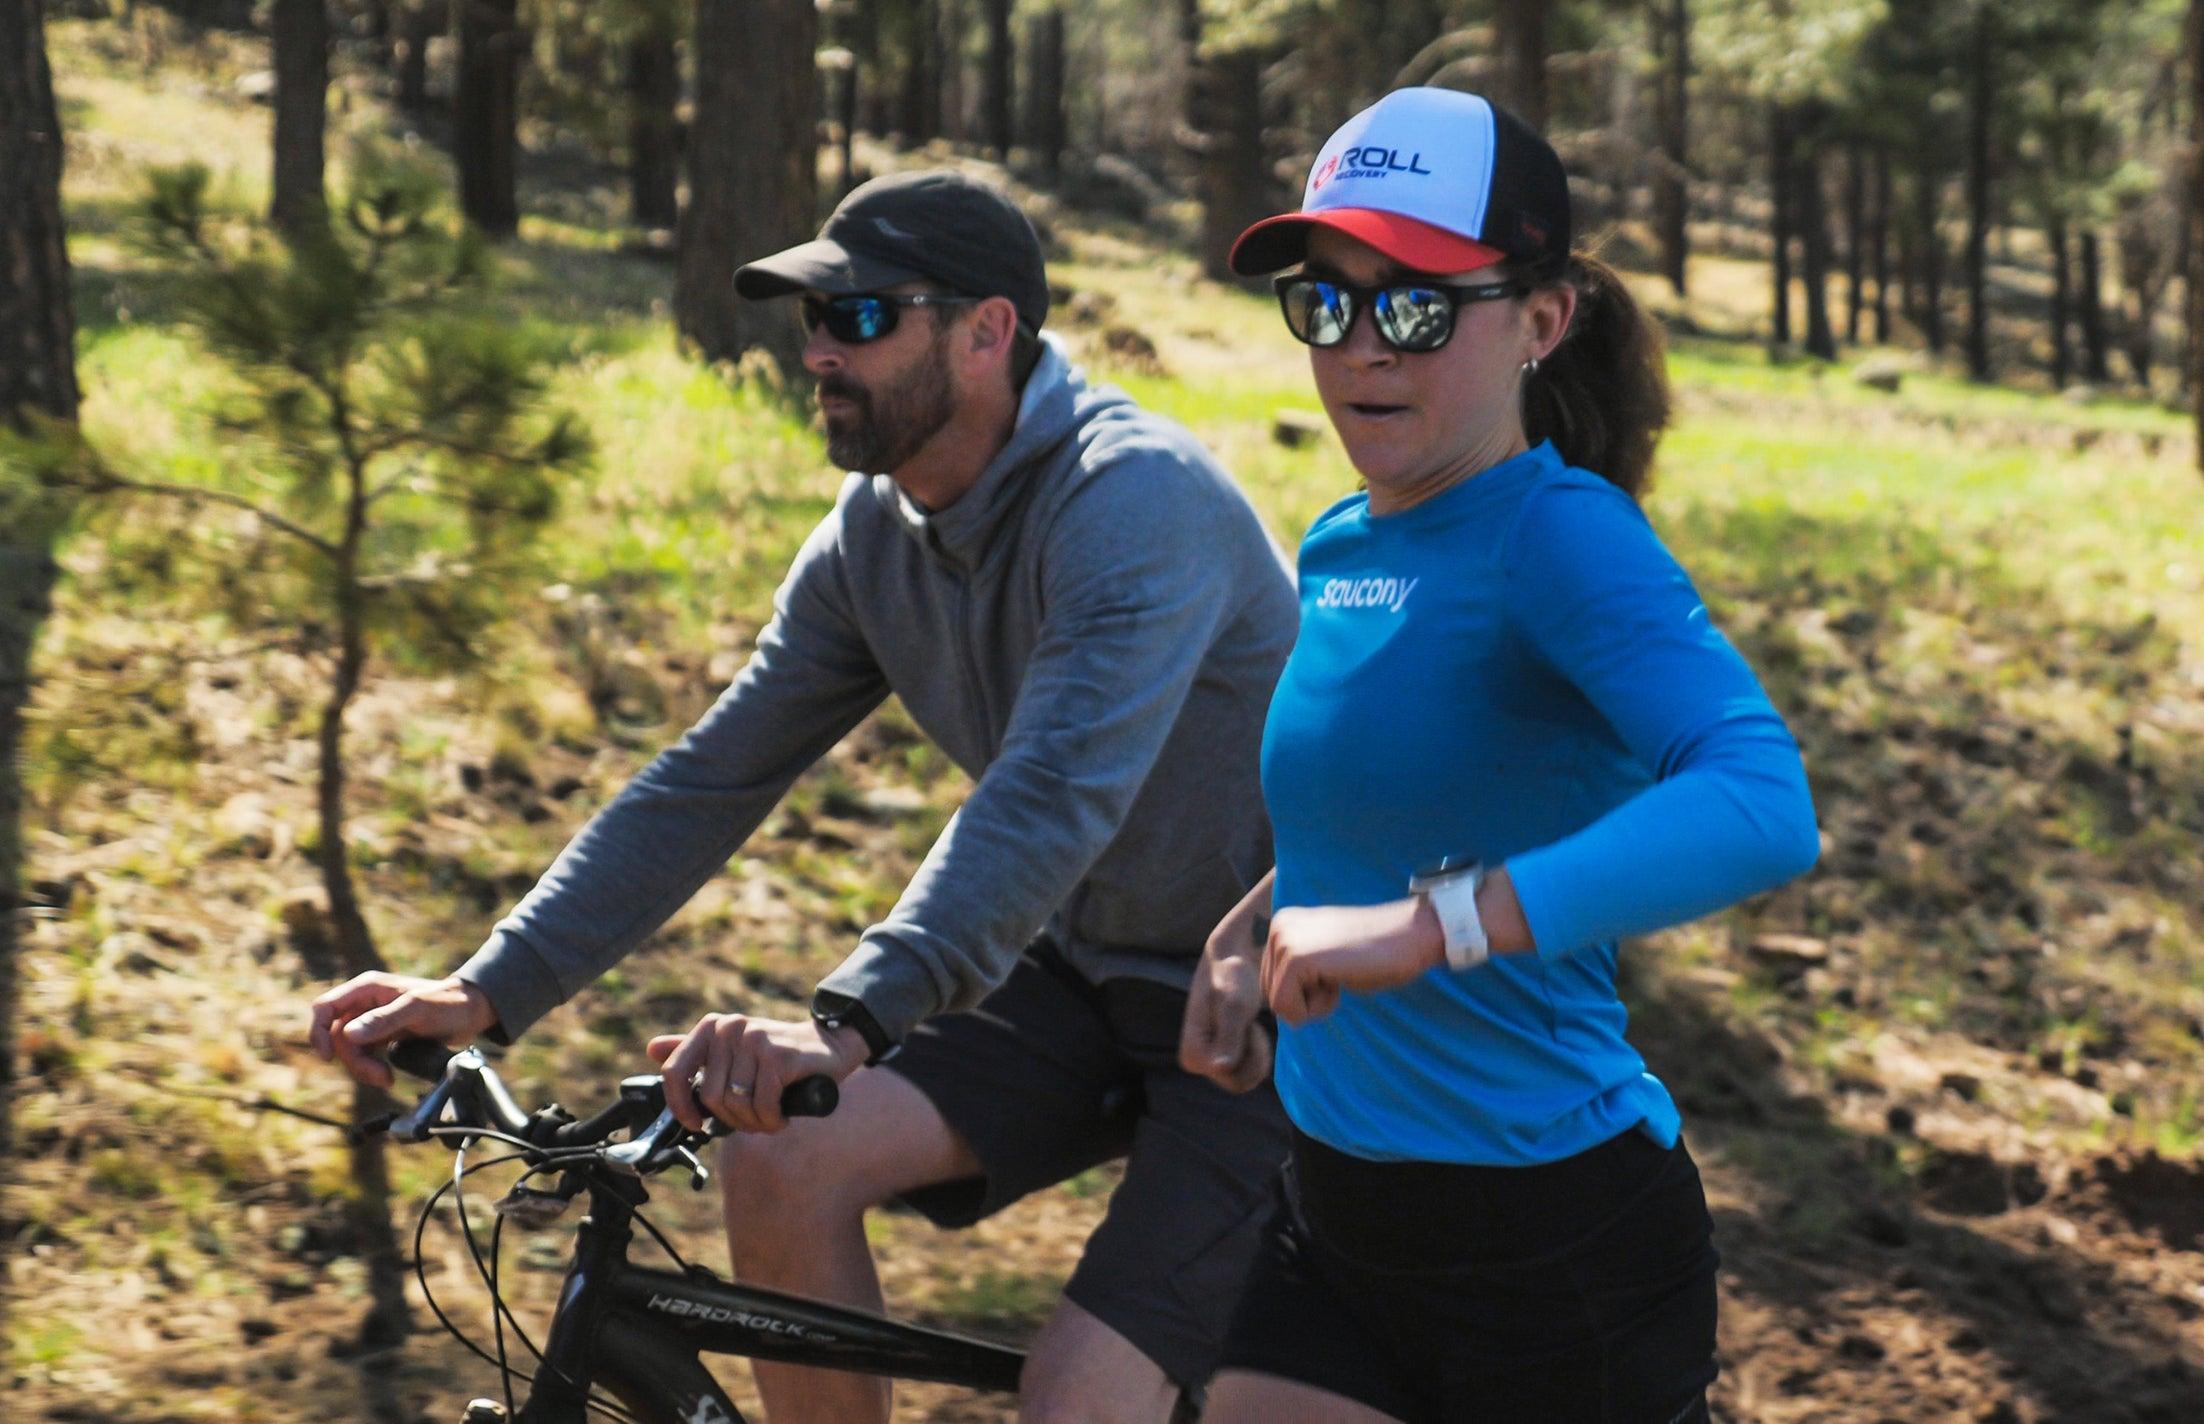 Tim Broe coaching on bike